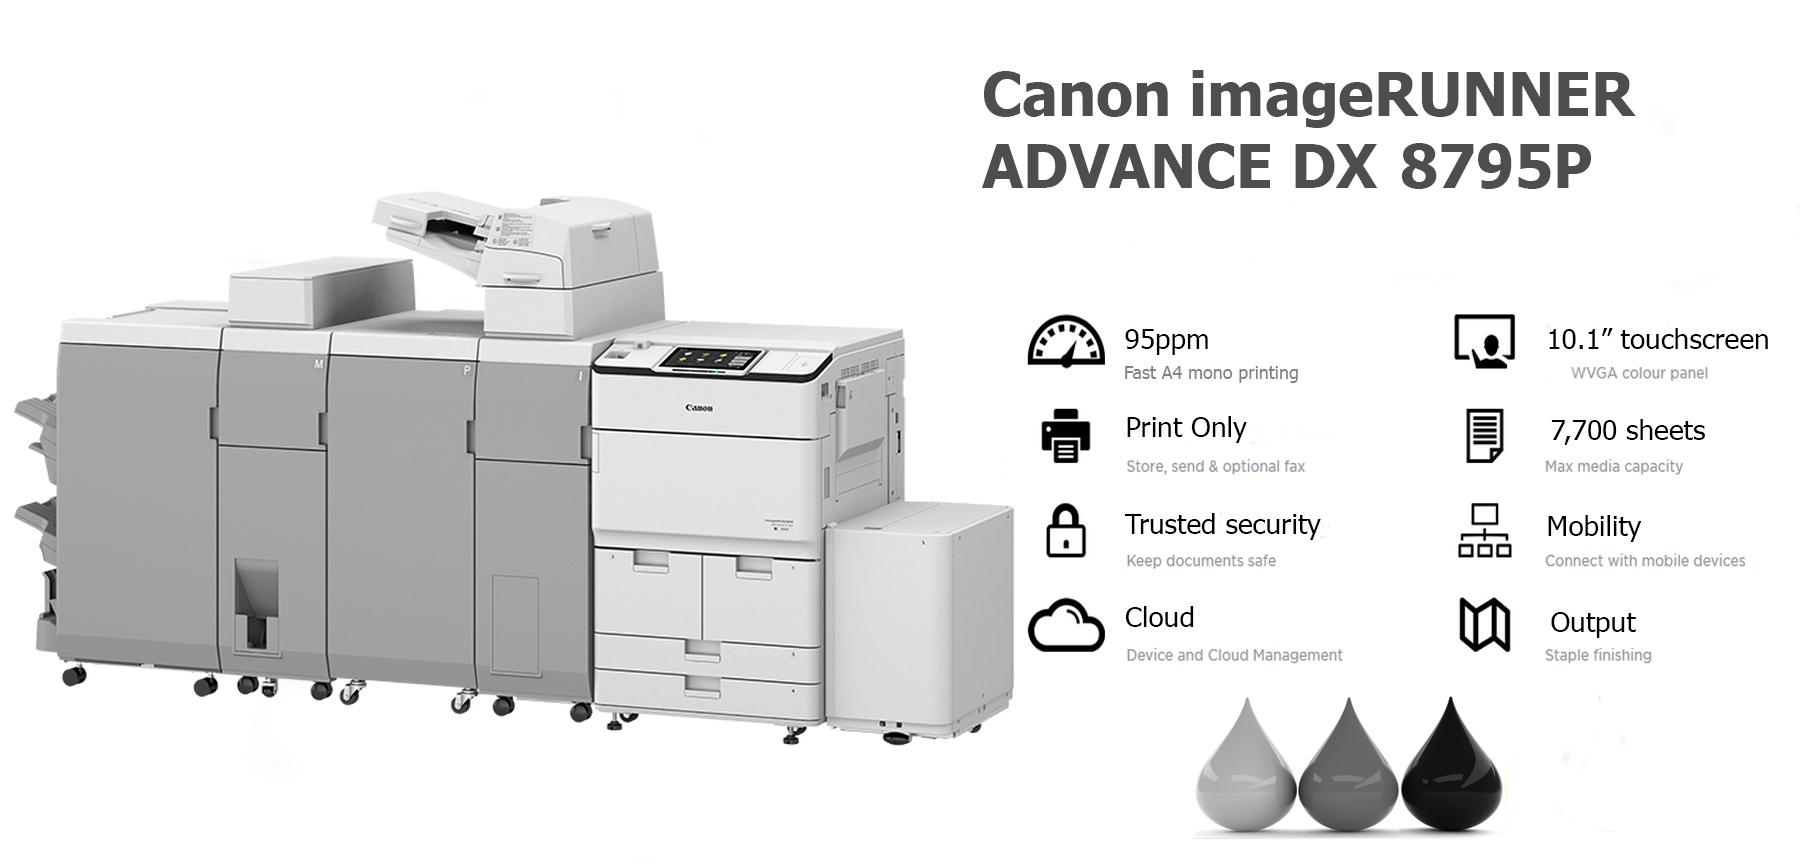 Canon imageRUNNER ADVANCE DX 8795P PRINTER LEASE RENTAL LANCASHIRE MANCHESTER